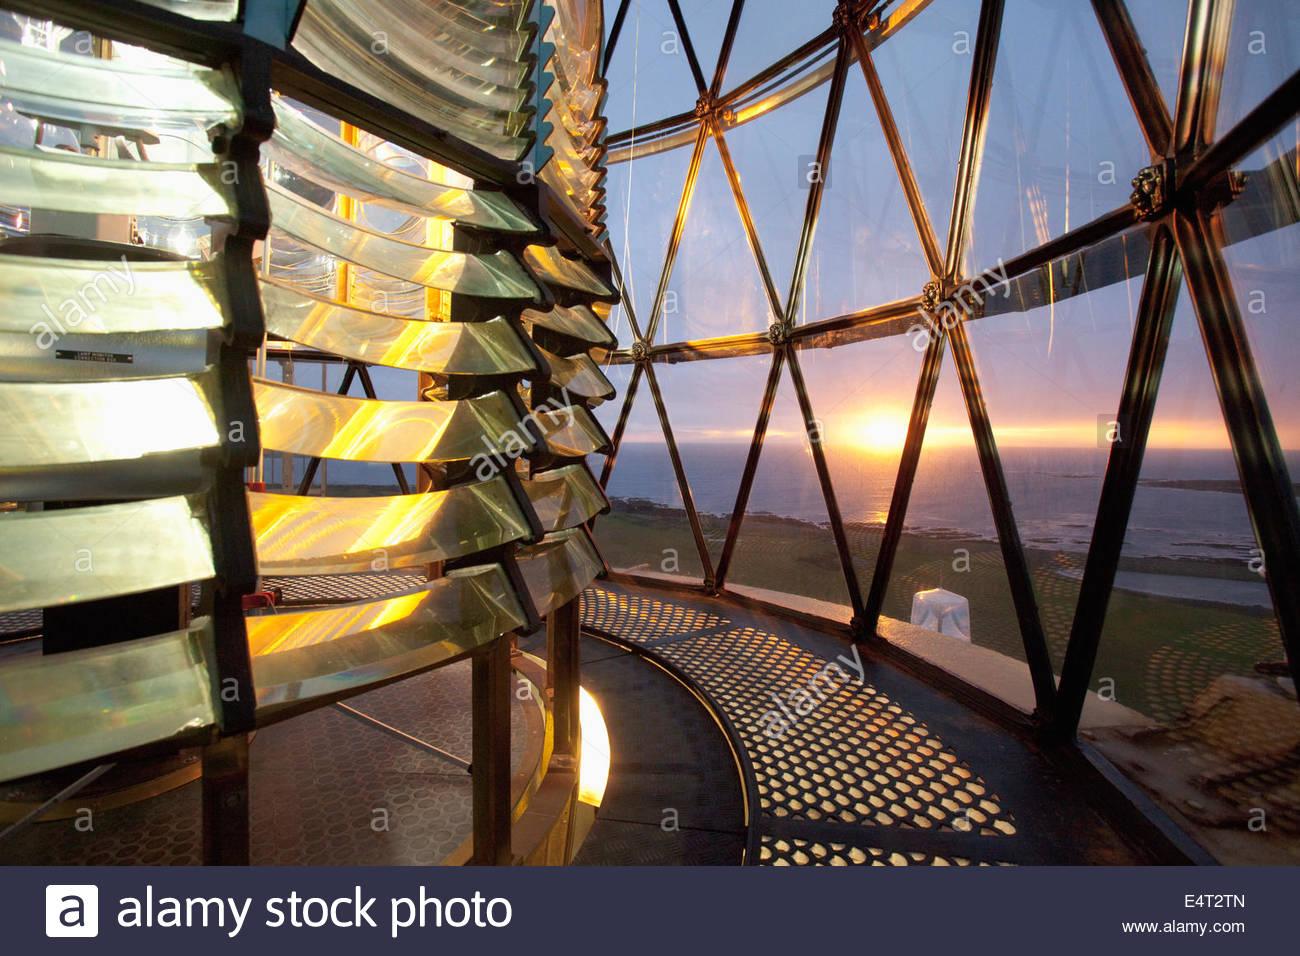 The lens of the North Ronaldsay Lighthouse photographed at sunset, North Ronaldsay, Orkney, Scotland. - Stock Image